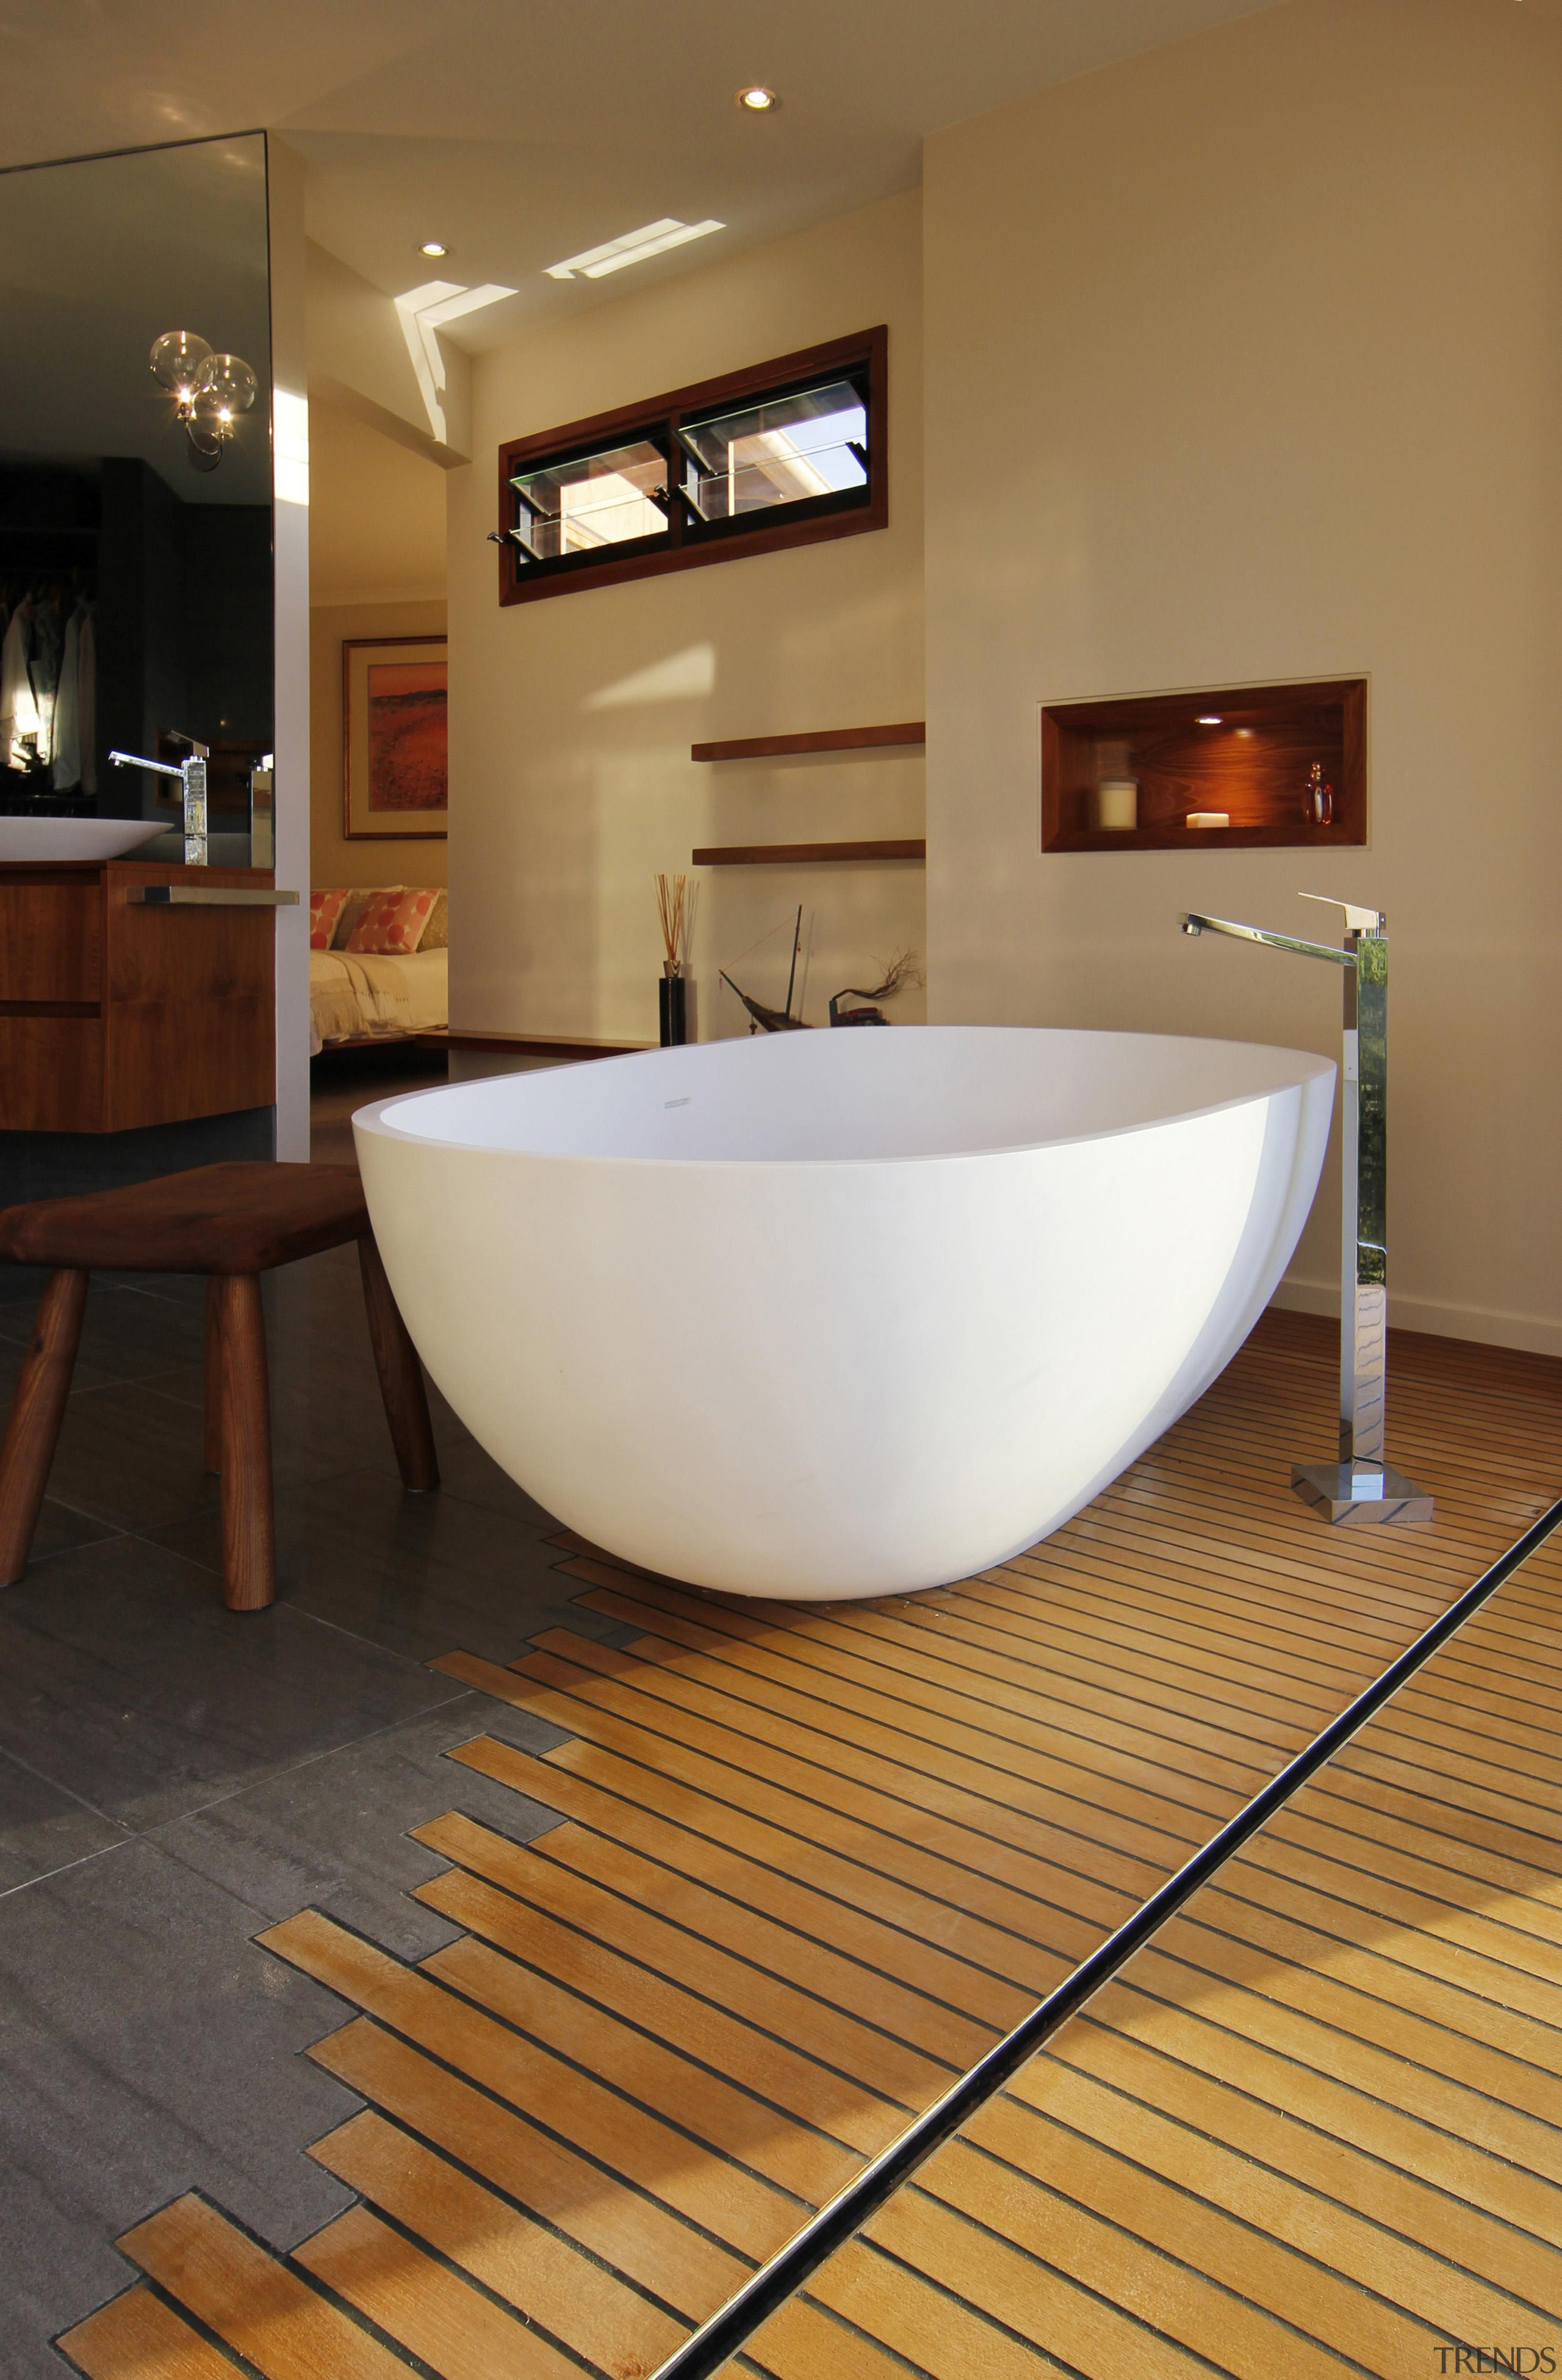 Winner Bathroom Design of the Year ACT Sthn bathroom, bathtub, floor, flooring, hardwood, interior design, plumbing fixture, product design, room, sink, tile, wood flooring, brown